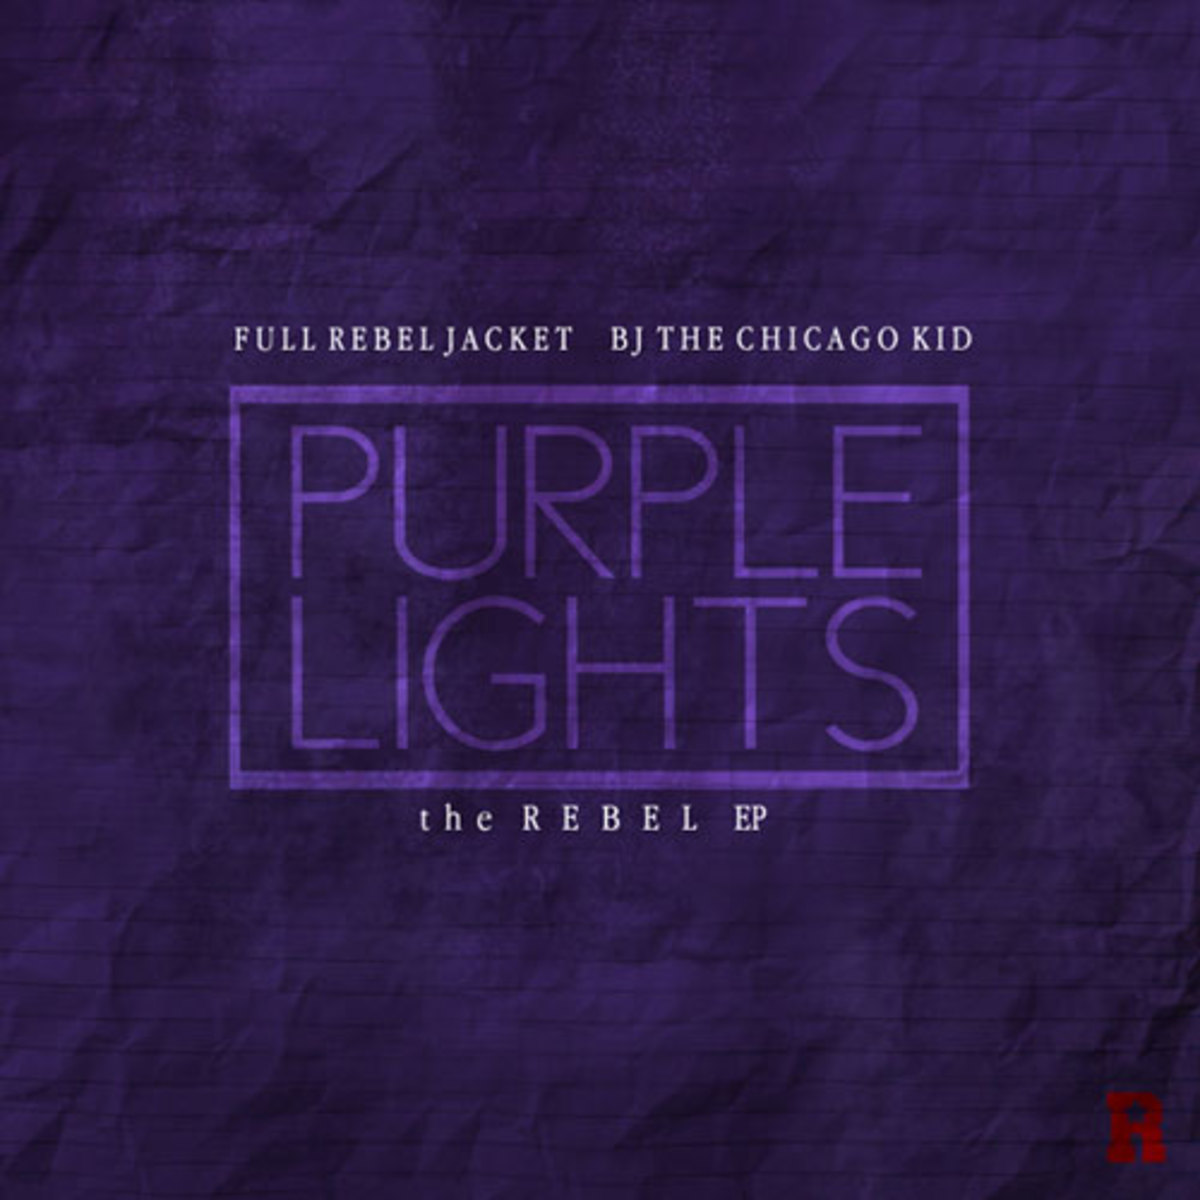 fullrebeljacket-purple.jpg